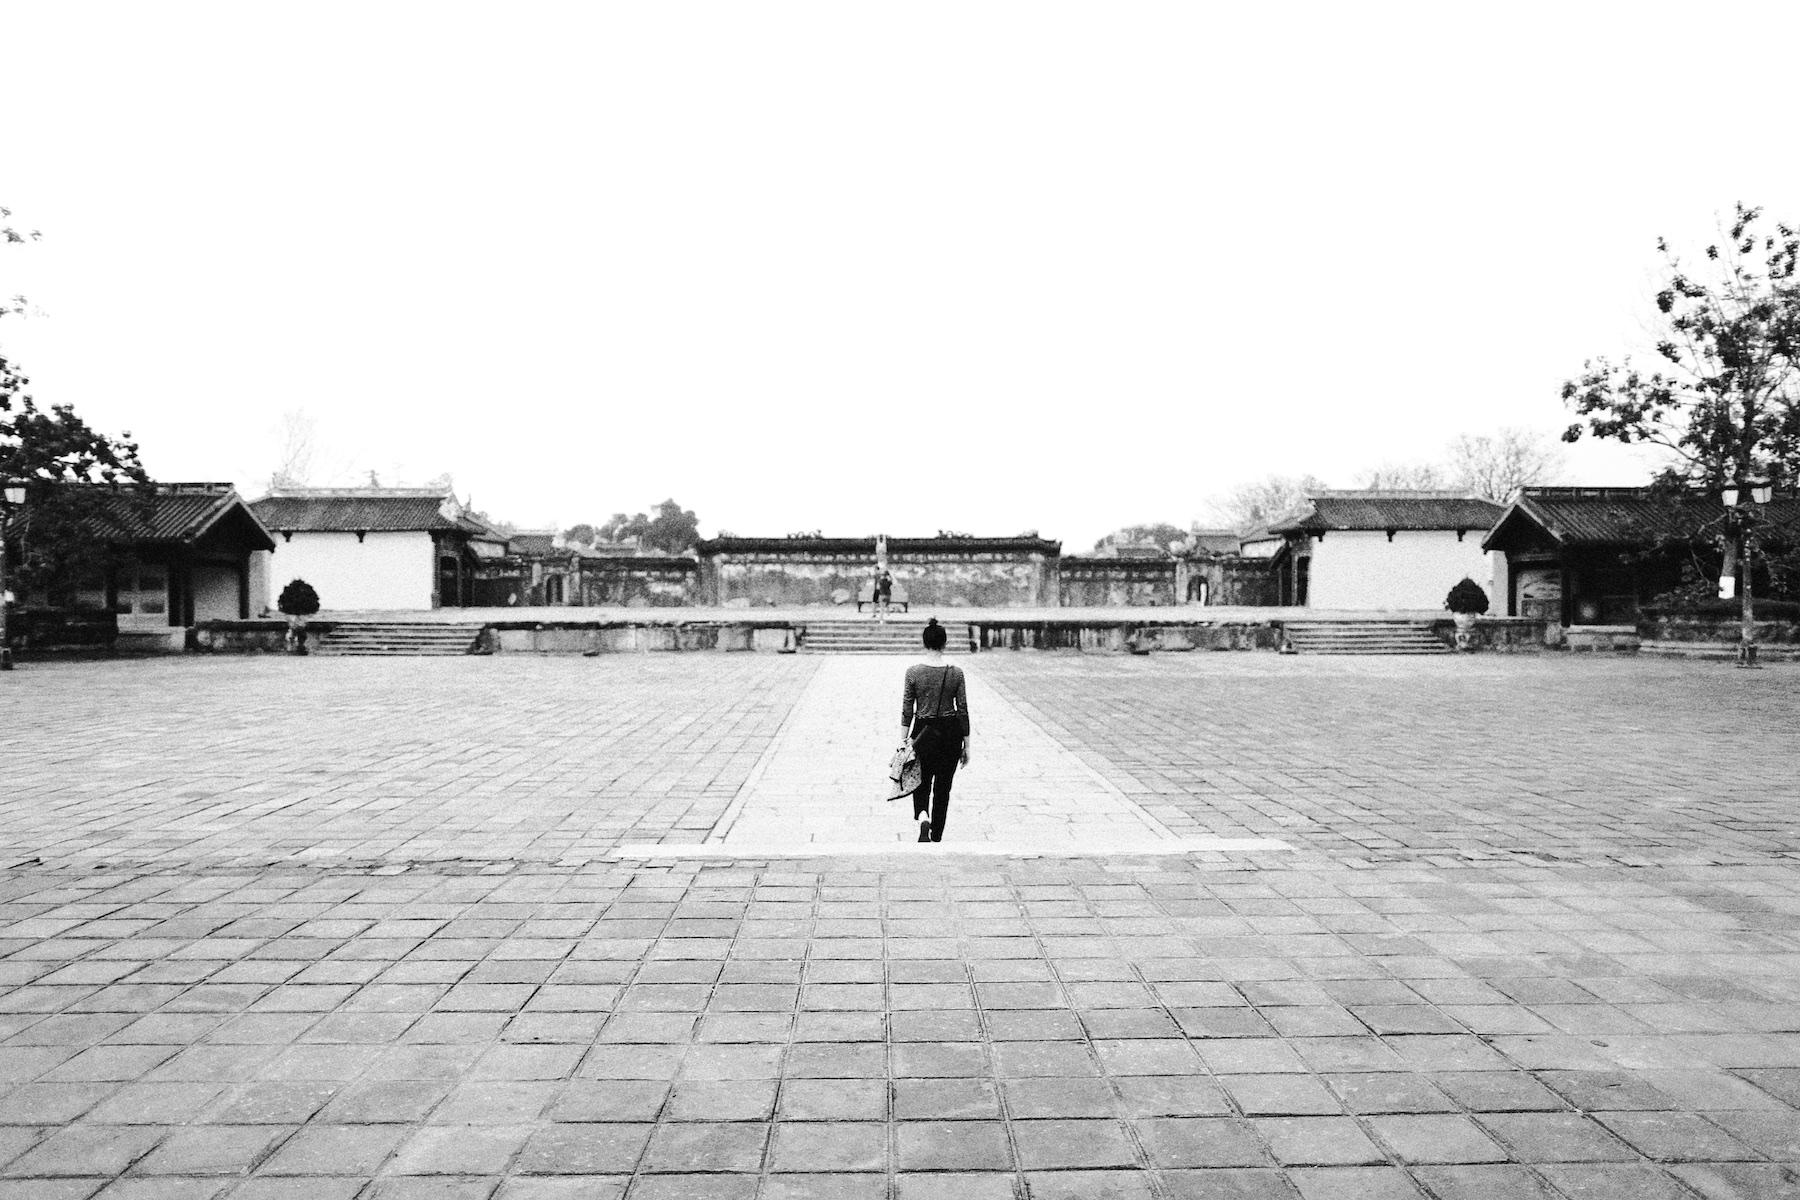 IMPERIAL PALACE HUE © Manoah Biesheuvel